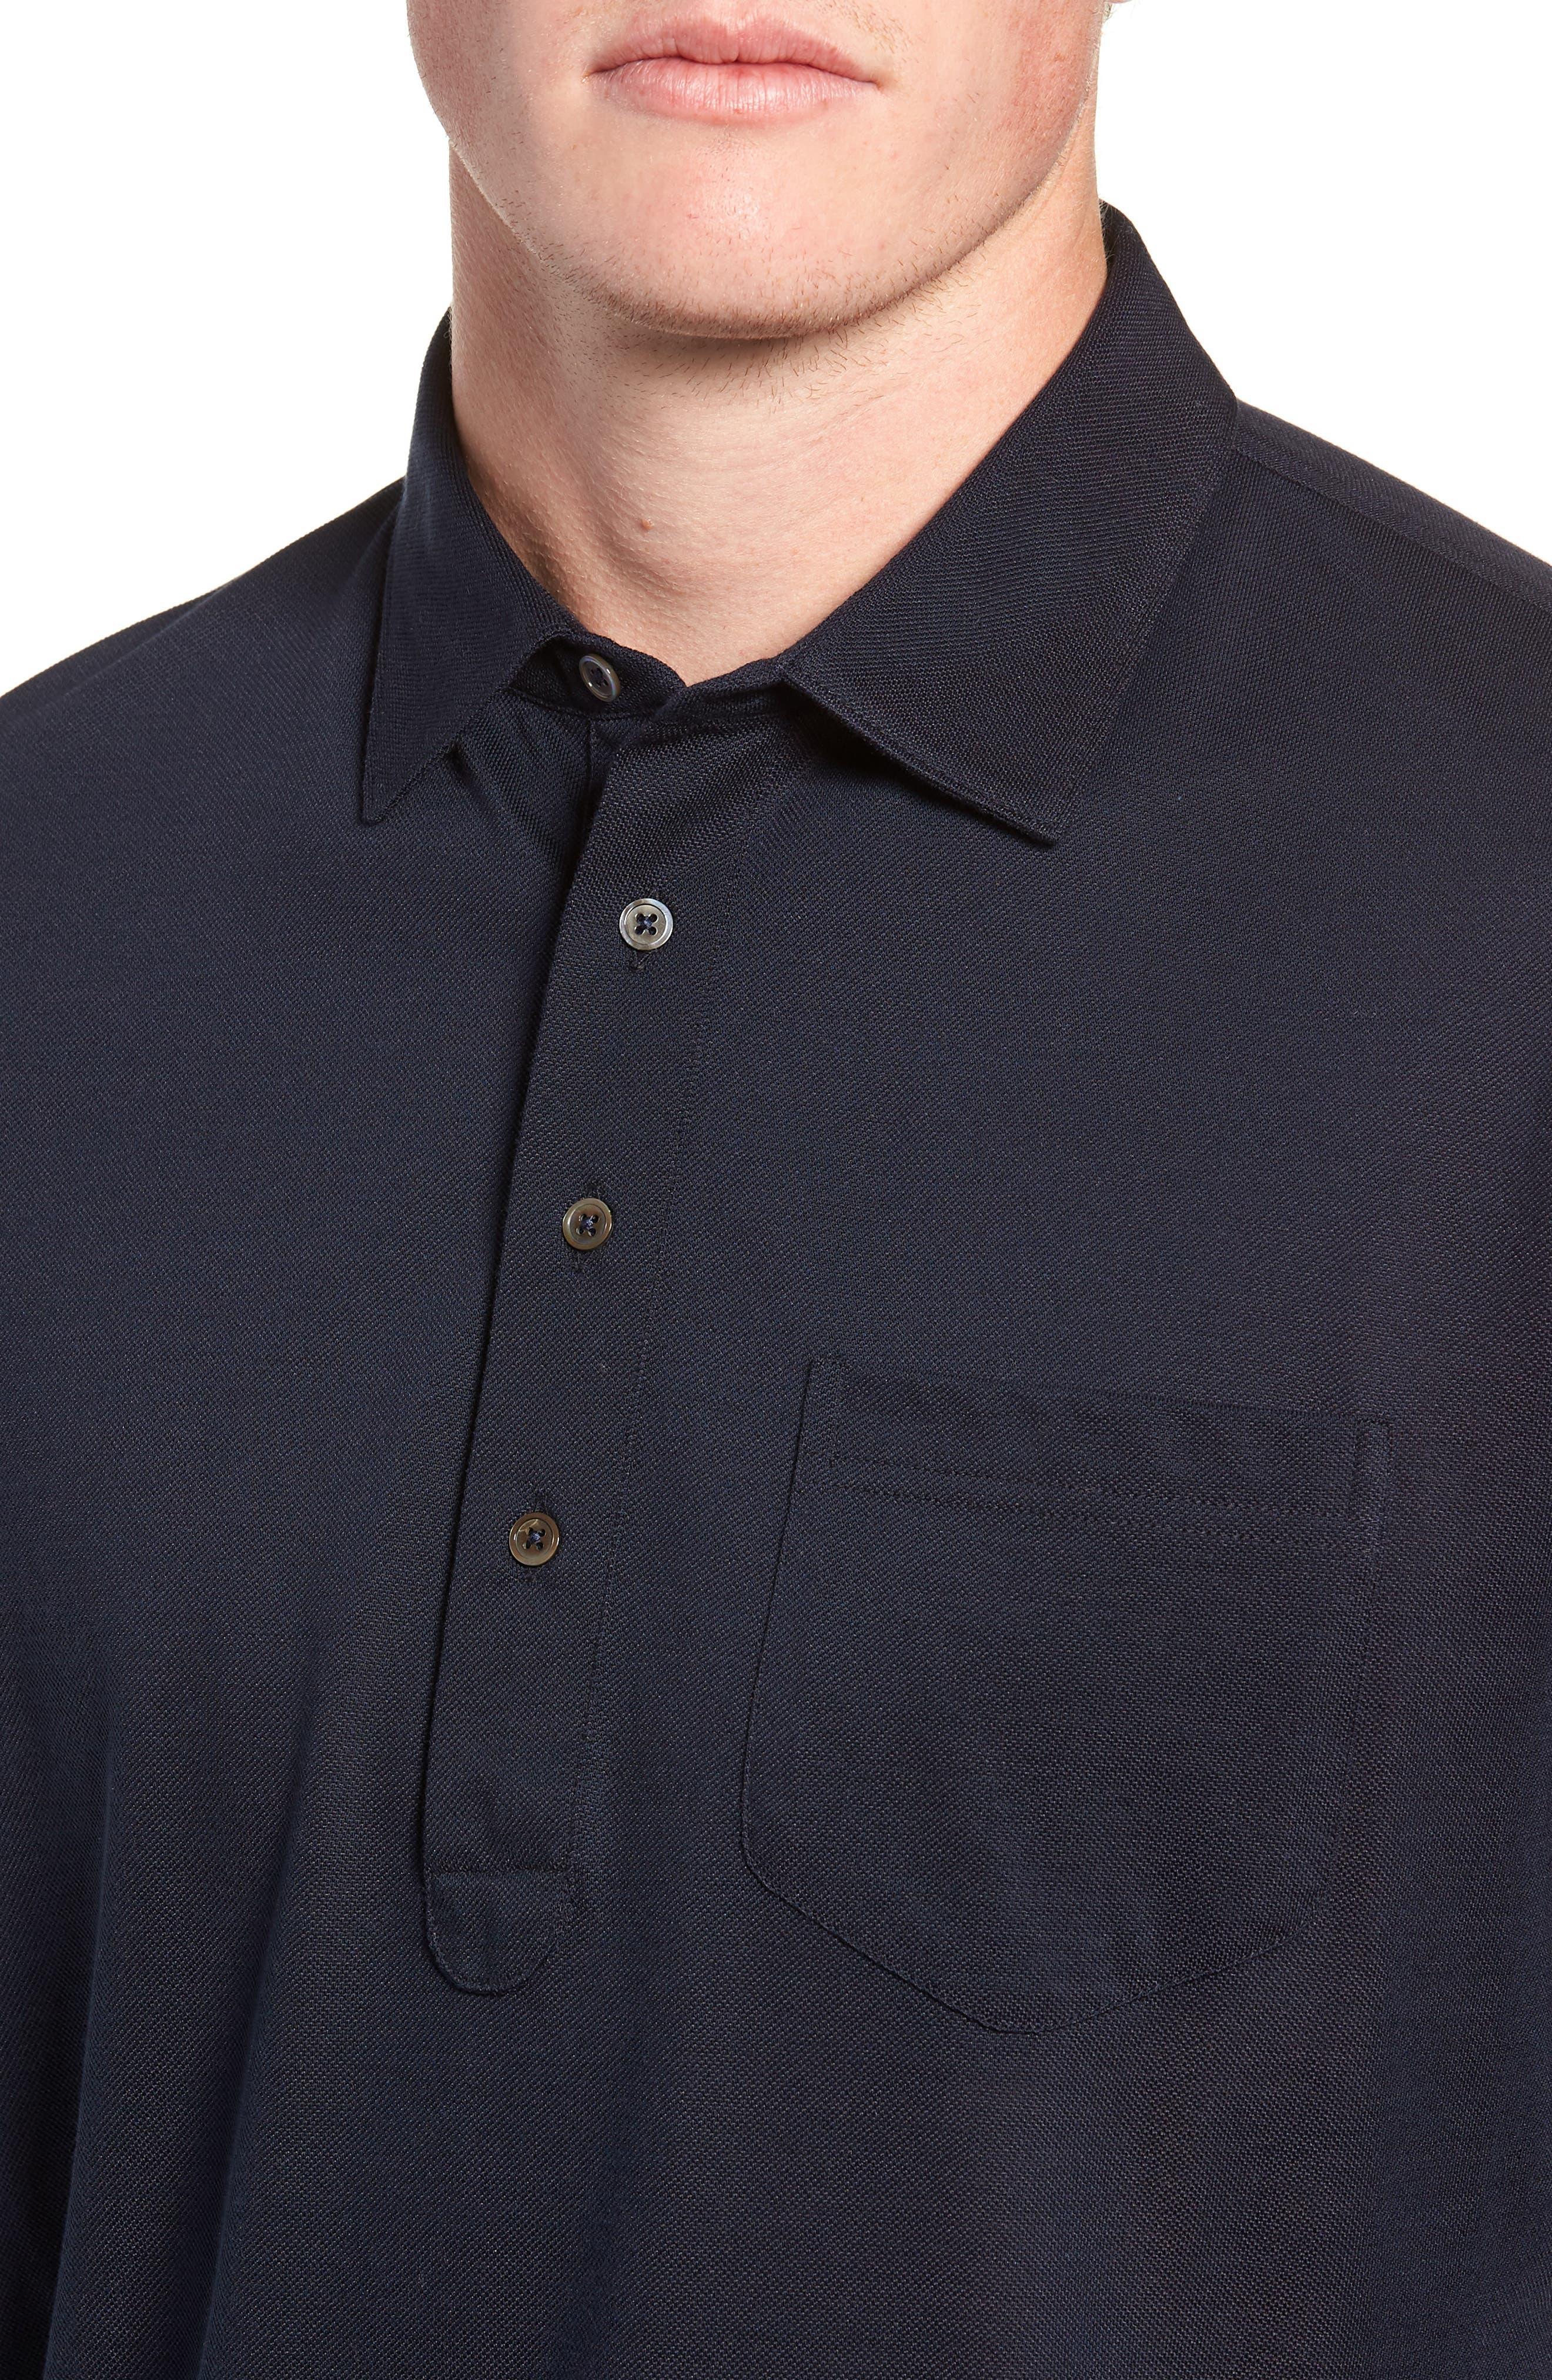 Avon Long Sleeve Silk & Cotton Polo,                             Alternate thumbnail 4, color,                             BARCHETTA